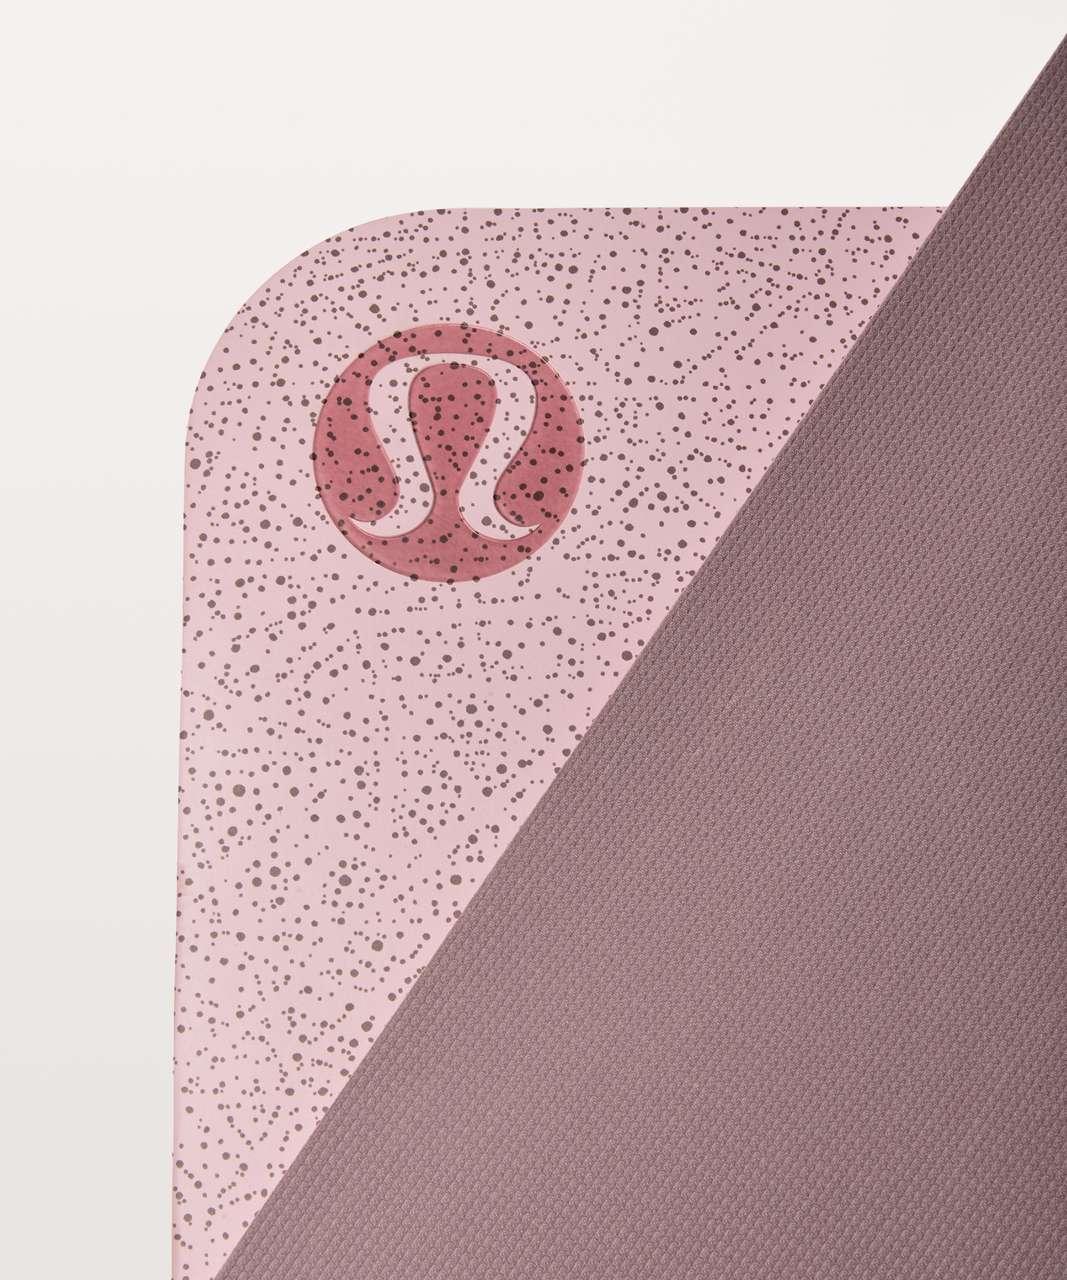 Lululemon The Reversible Mat 3mm - Night View Porcelain Pink Misty Mauve / Misty Mauve